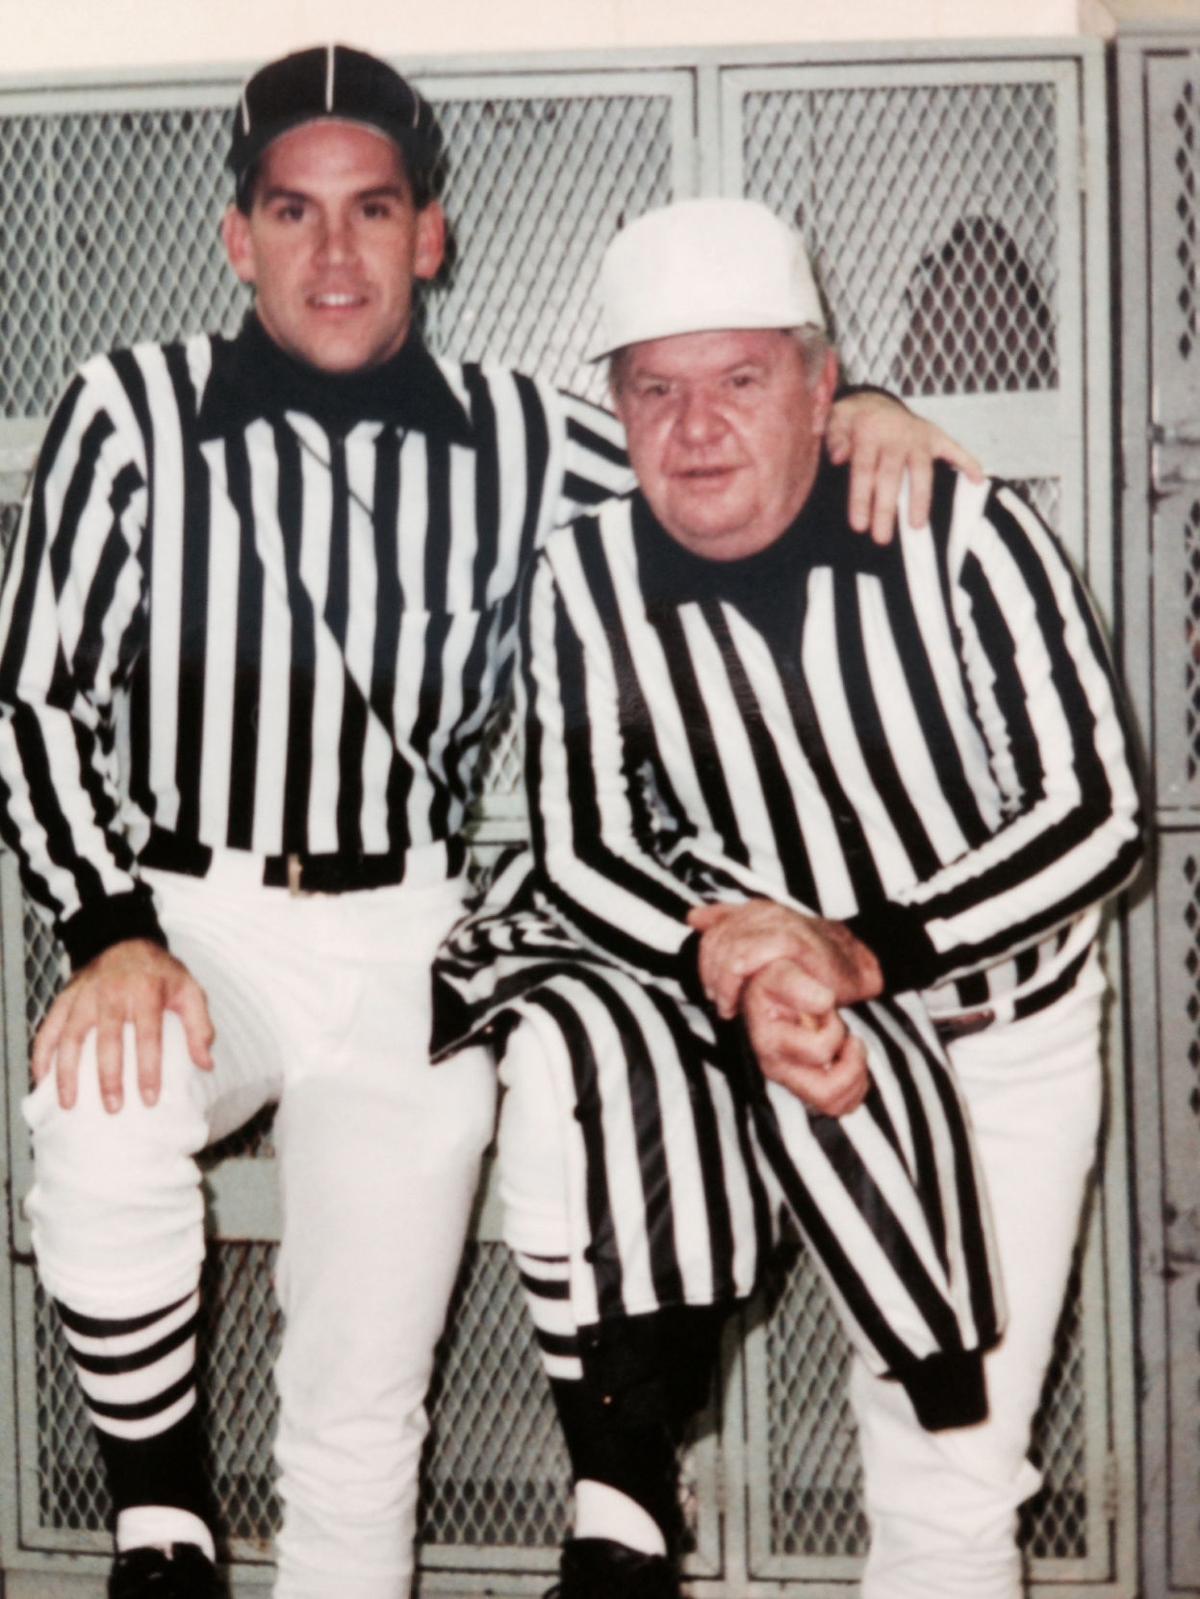 73db4ddb9 Shatel  Super Bowl referee Clete Blakeman s professionalism impresses his  fellow NFL officials